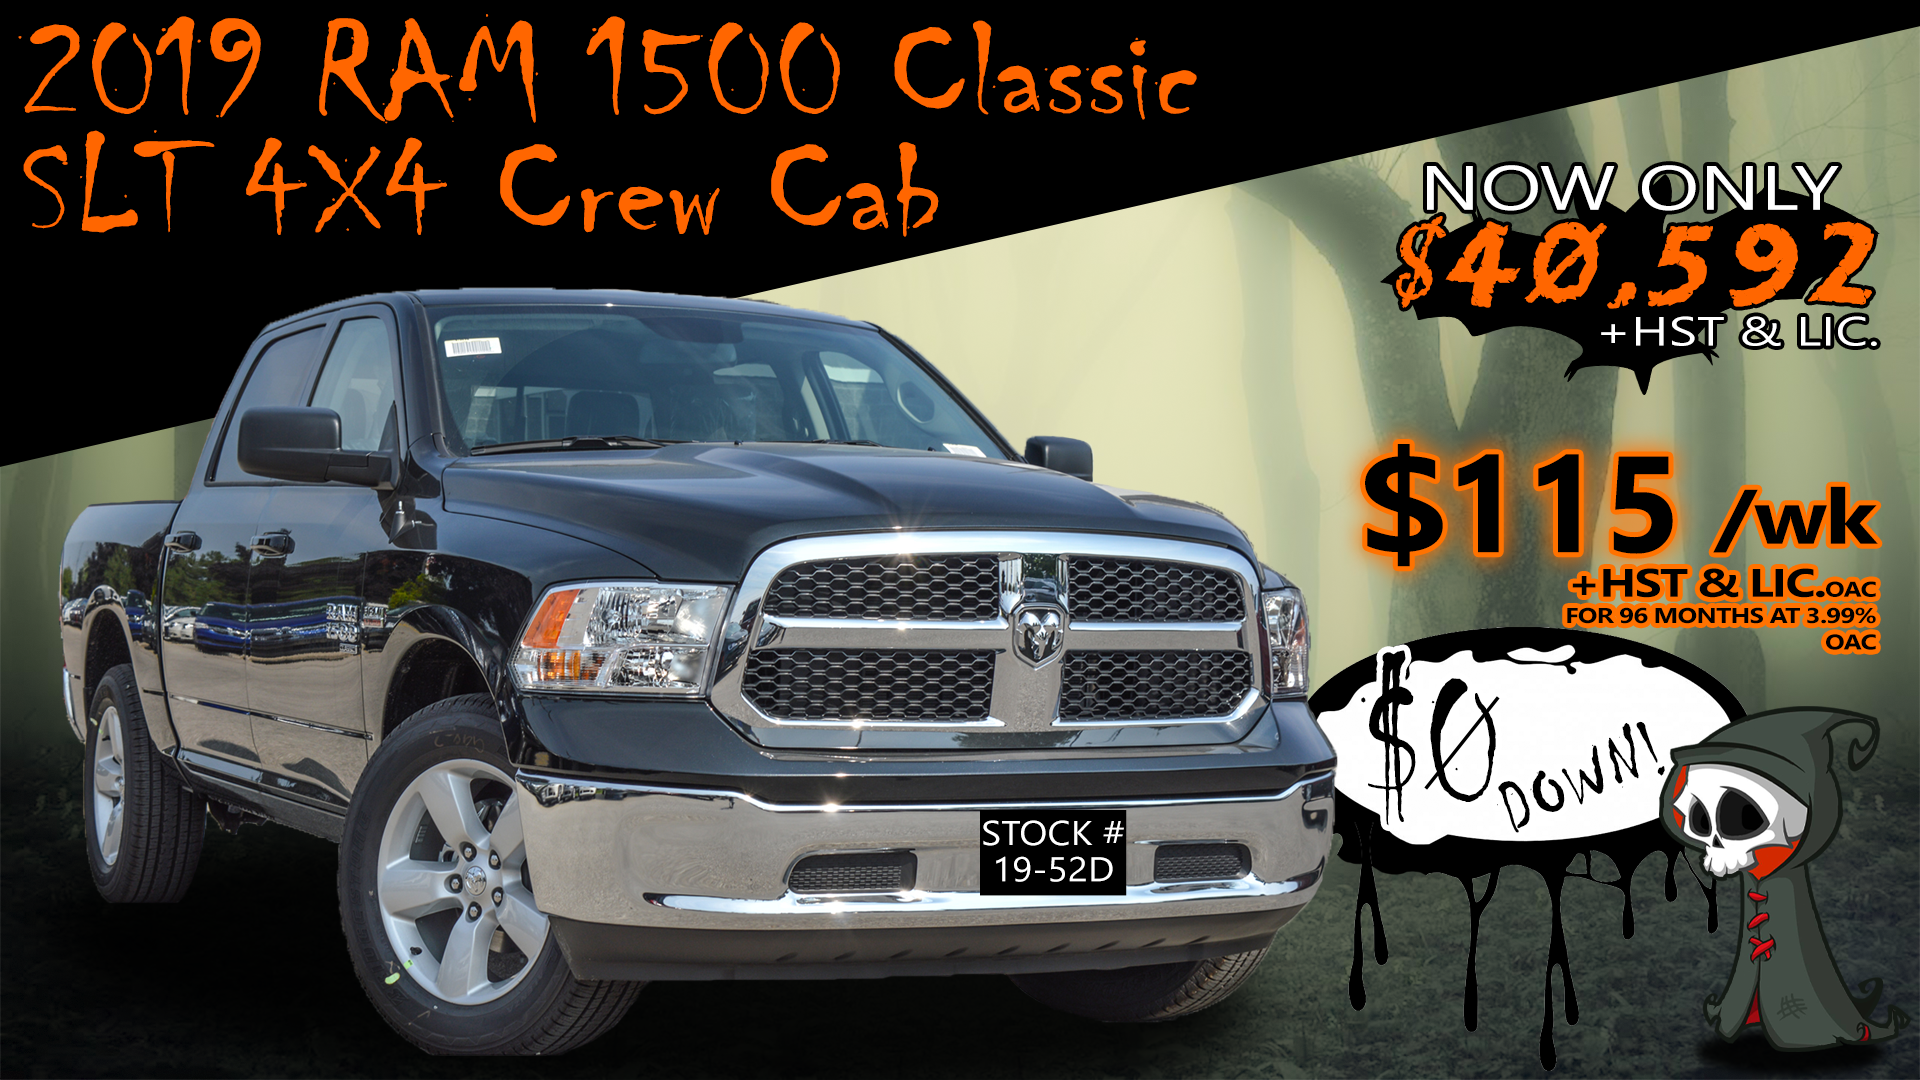 2019 Ram 1500 Classic SLT / Crew Cab / Hemi / Warranty / 4x4 ... Truck Crew Cab